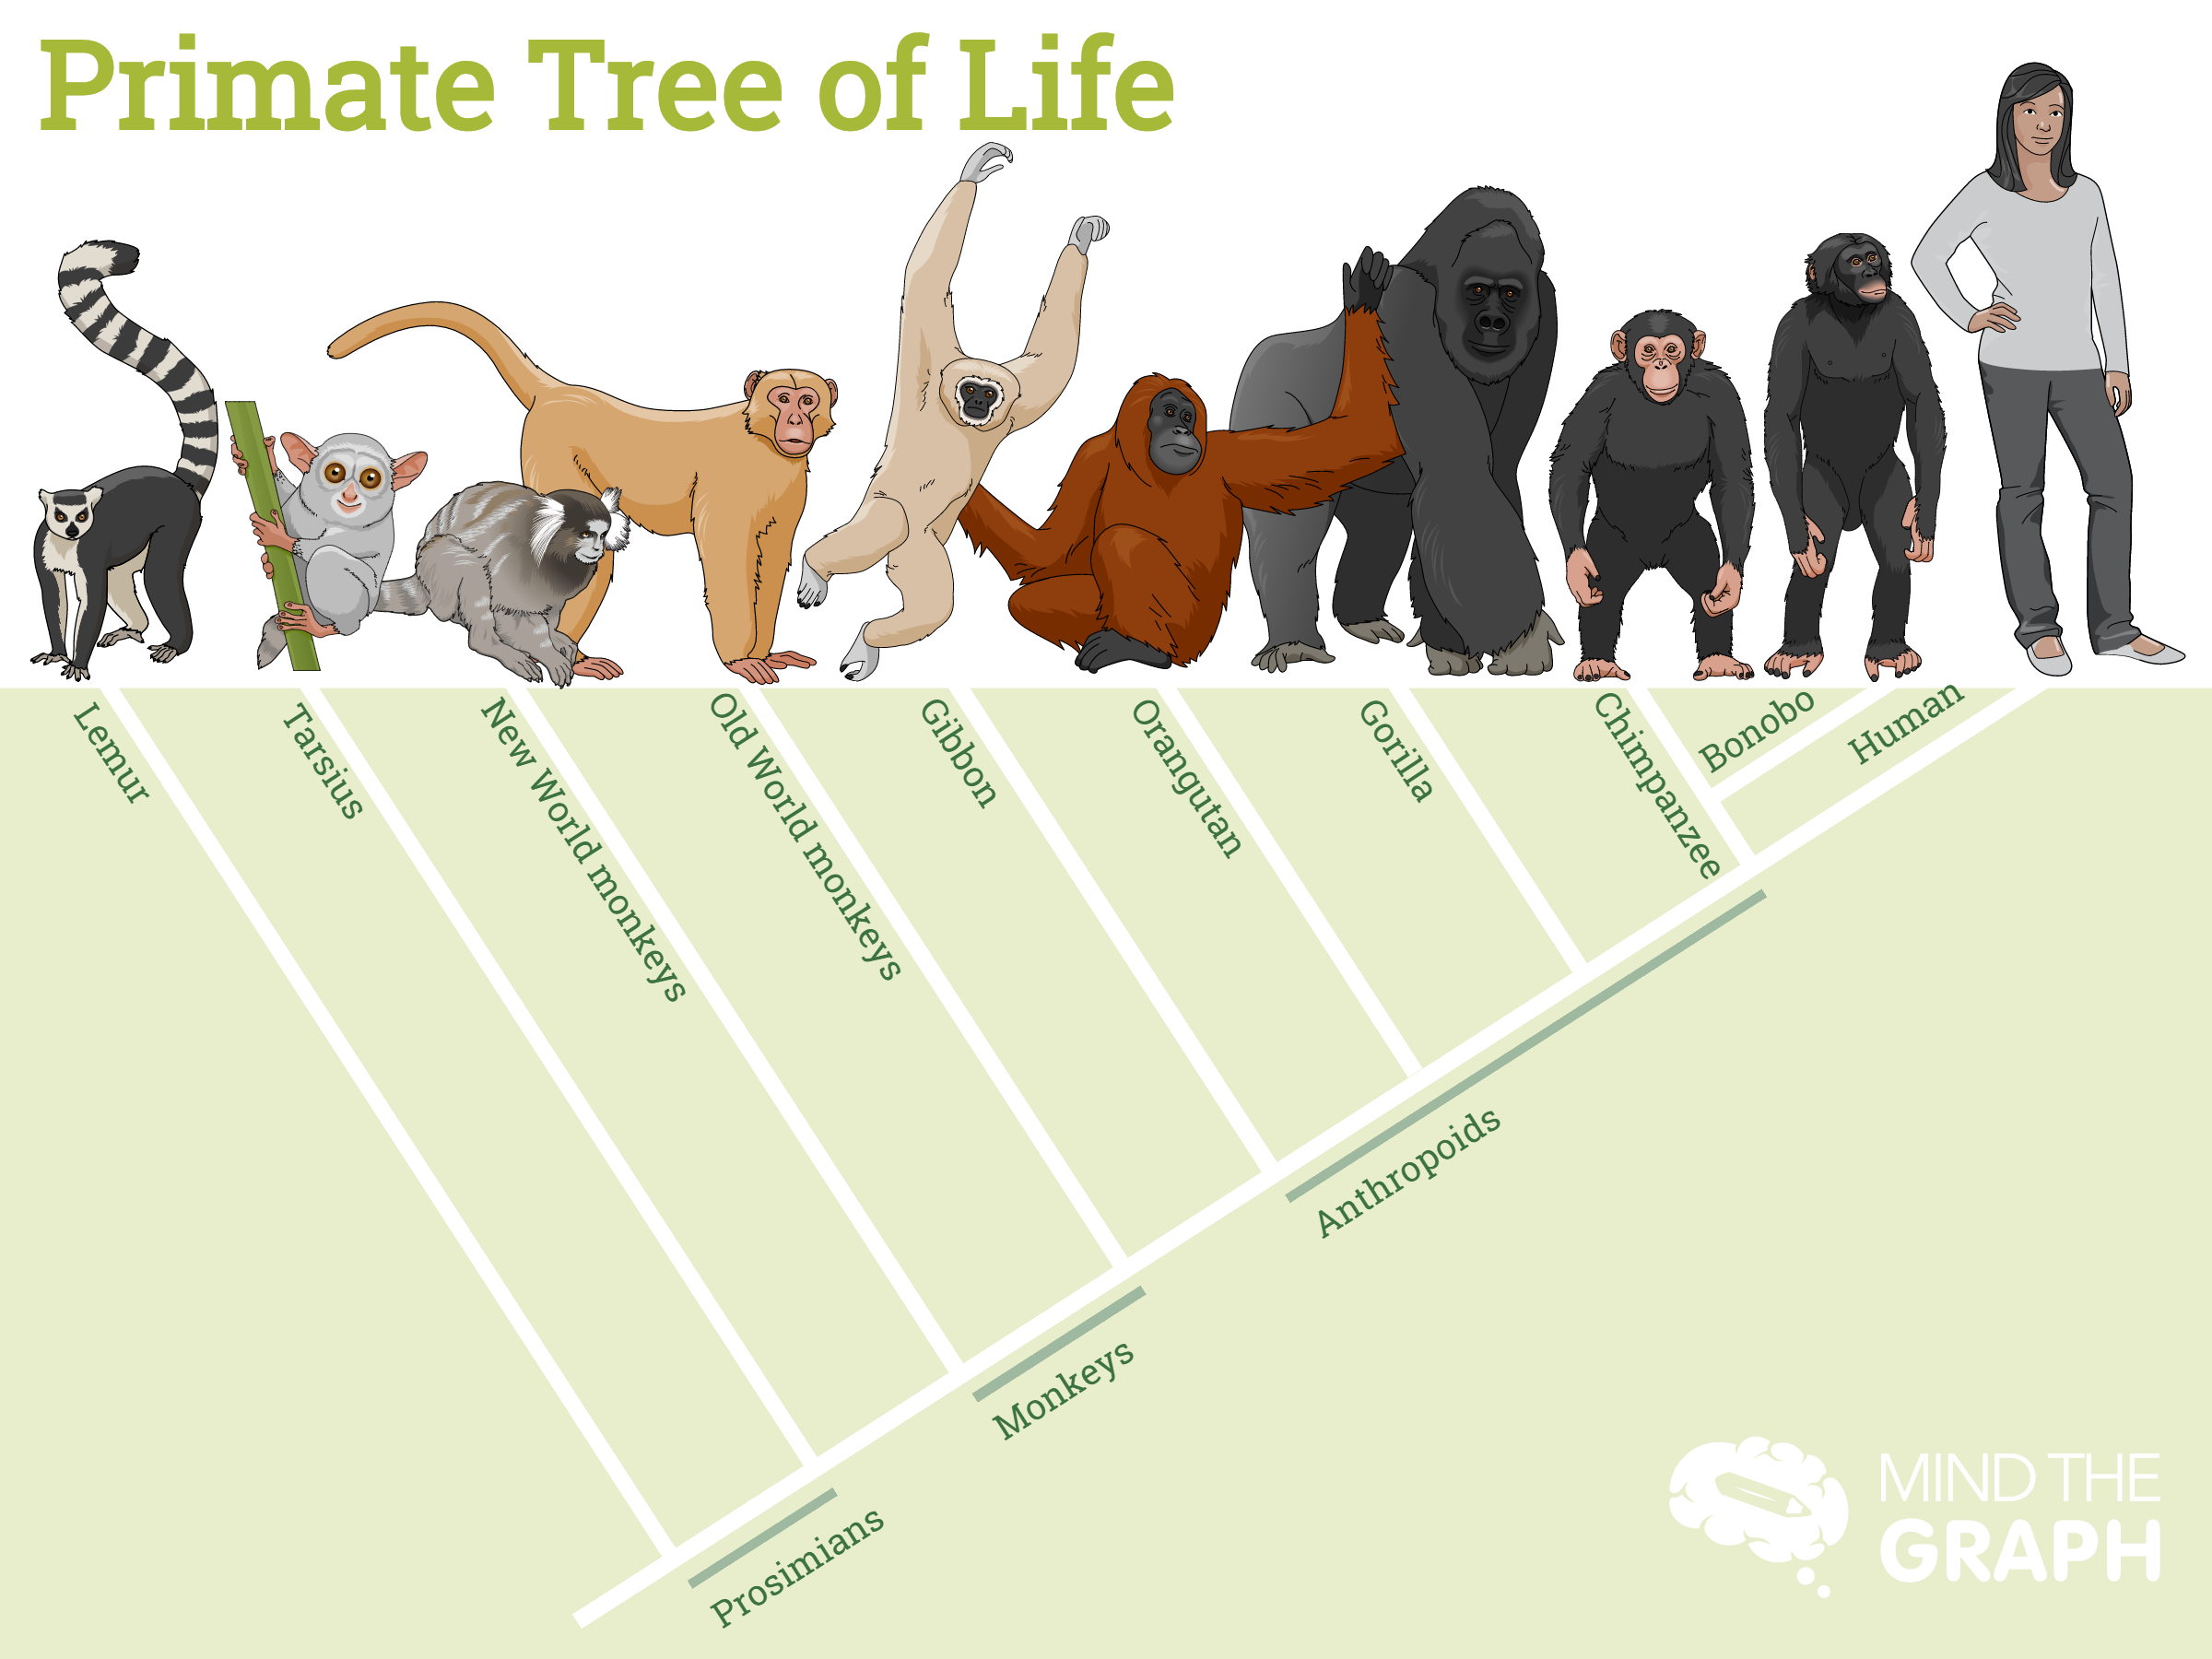 Primate tree of life